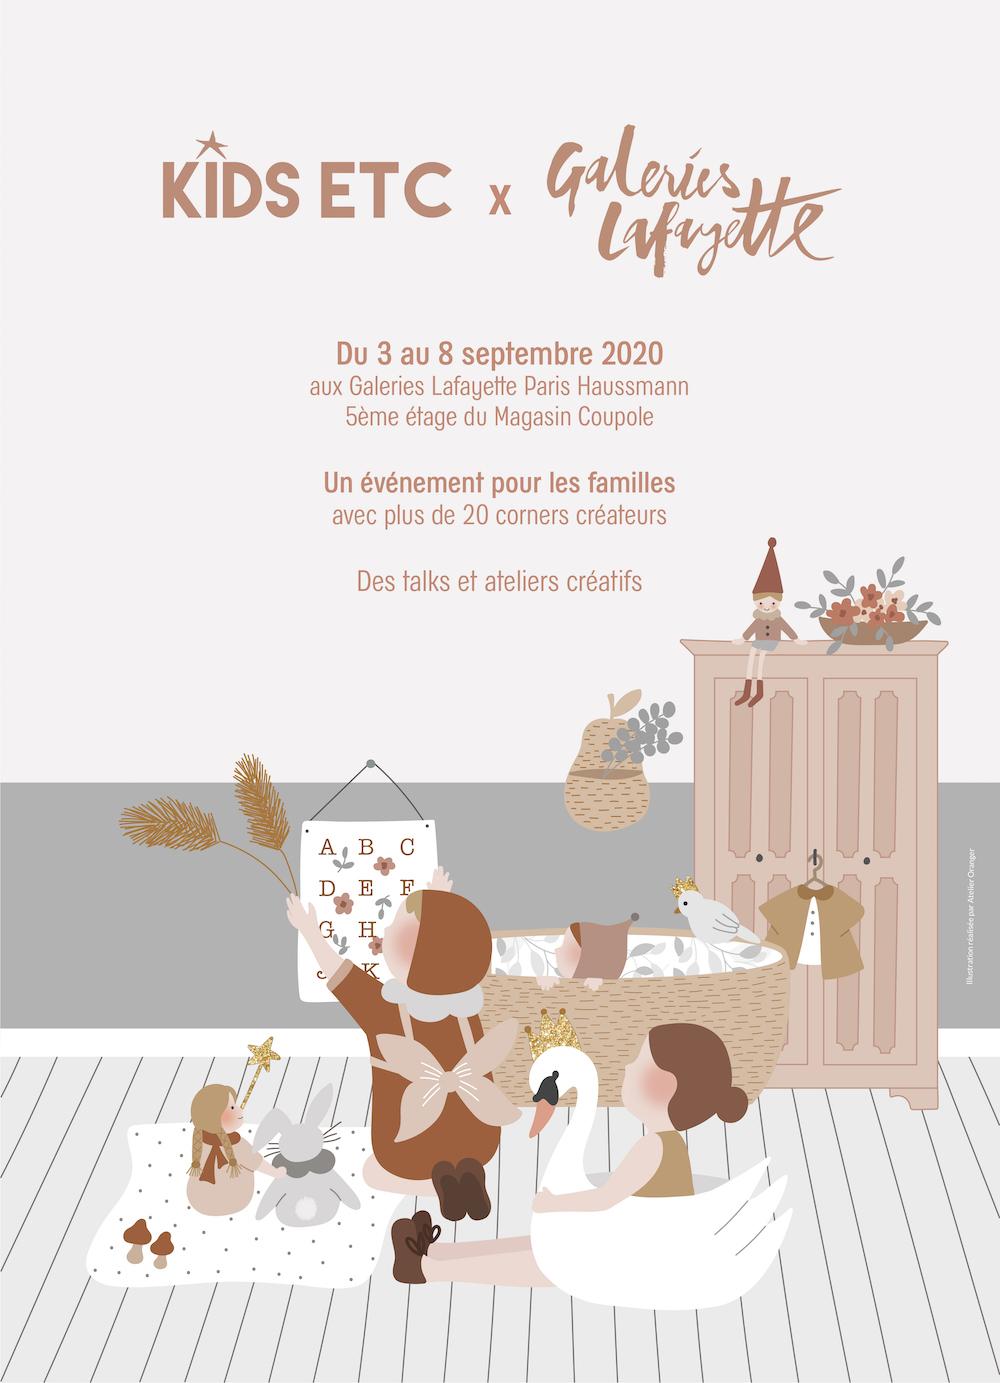 KIDS ETC x GALERIES LAFAYETTE – 3 AU 8 SEPT. 2020 - Blog famille Sunday Grenadine